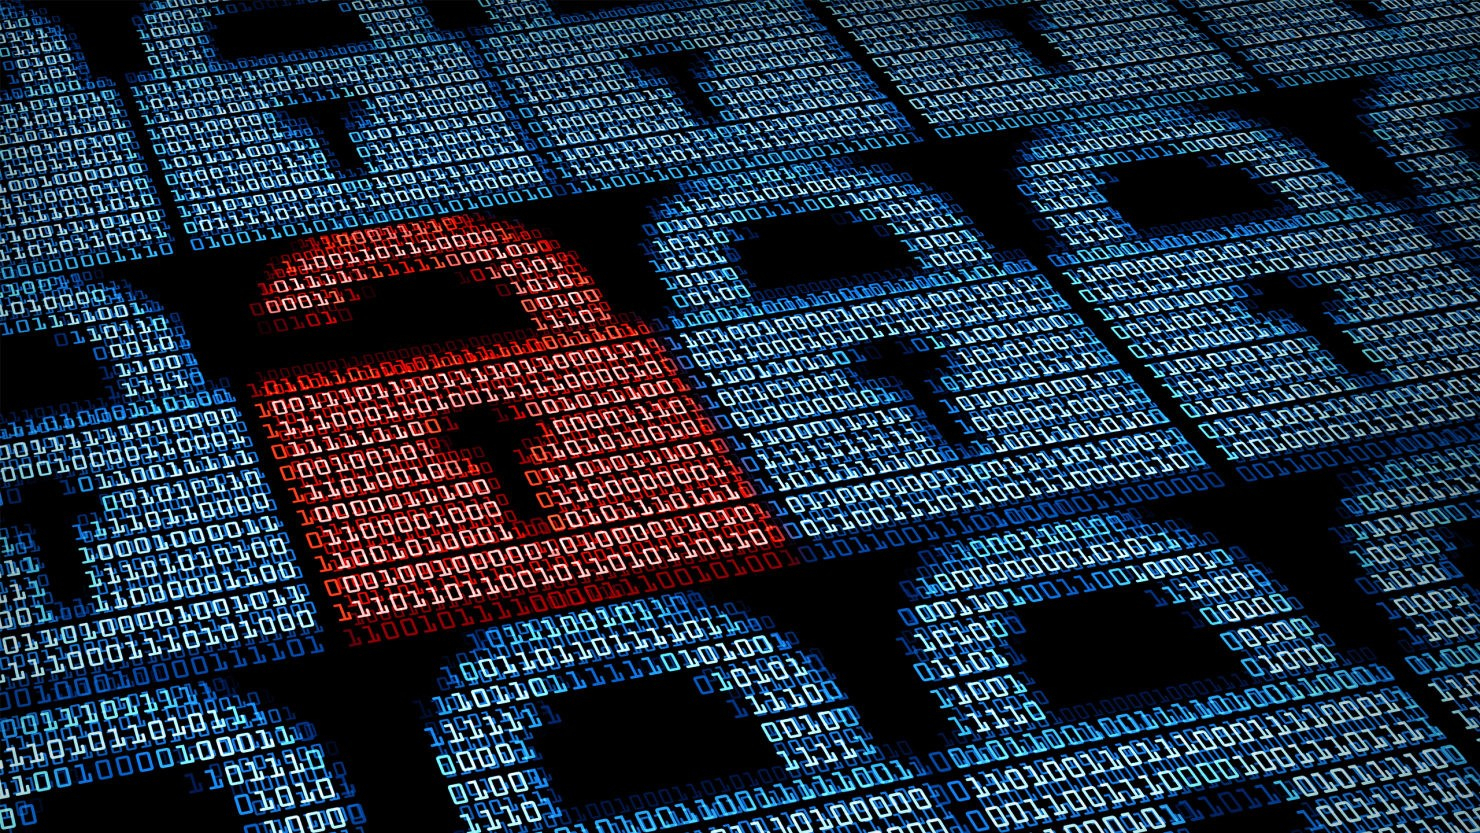 data protection, encryption, password protection, data backup